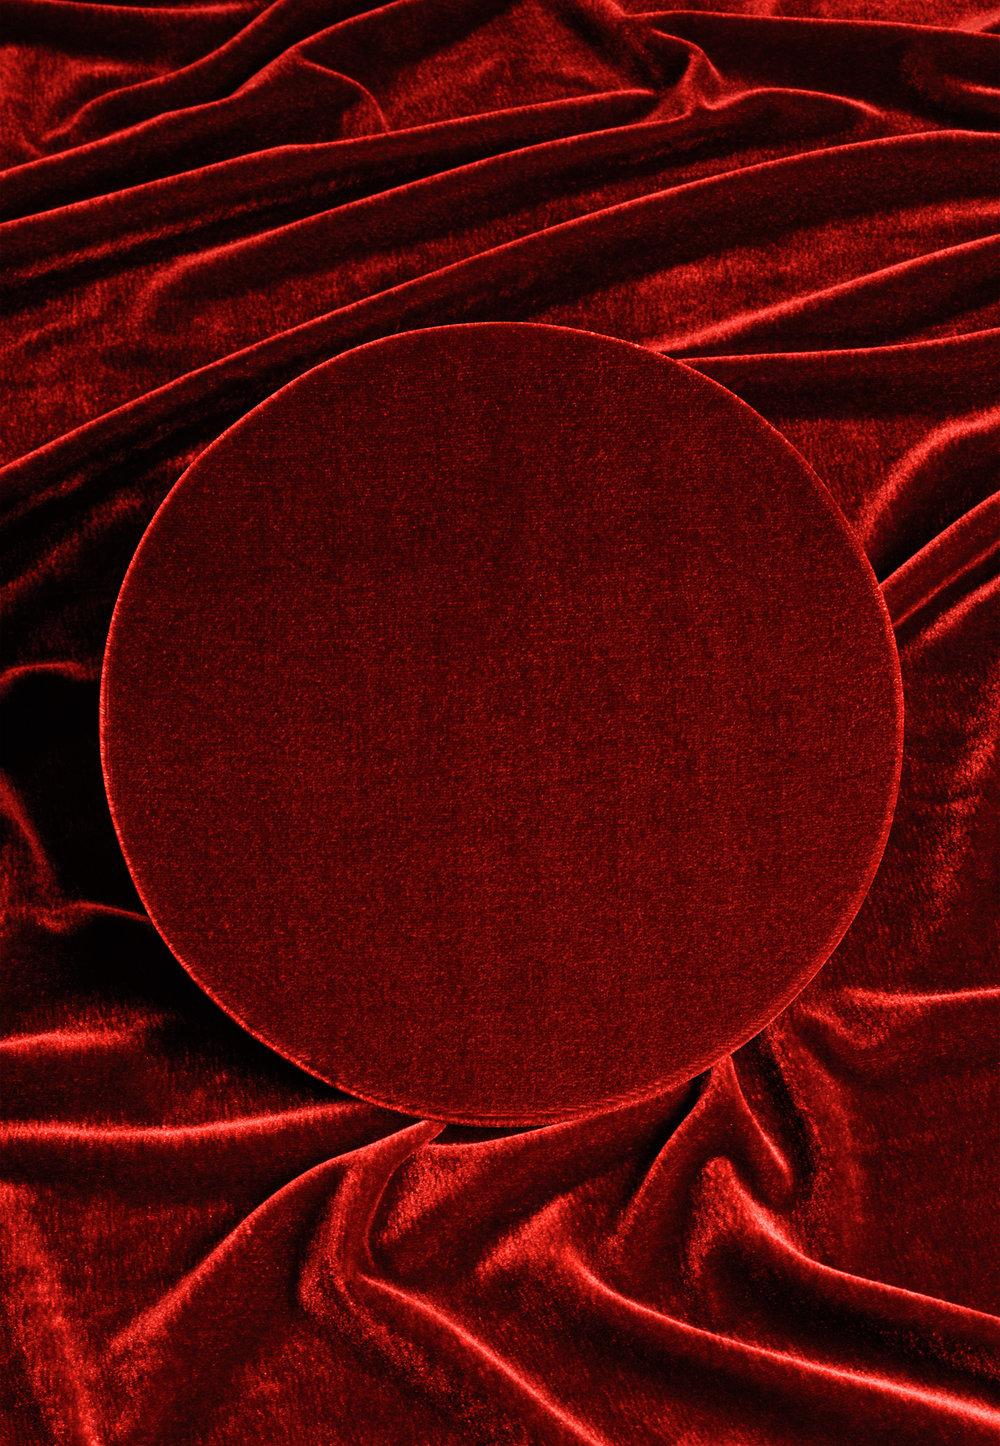 Red circle 2, 2016 C-Print, 52,5 x 36 cm